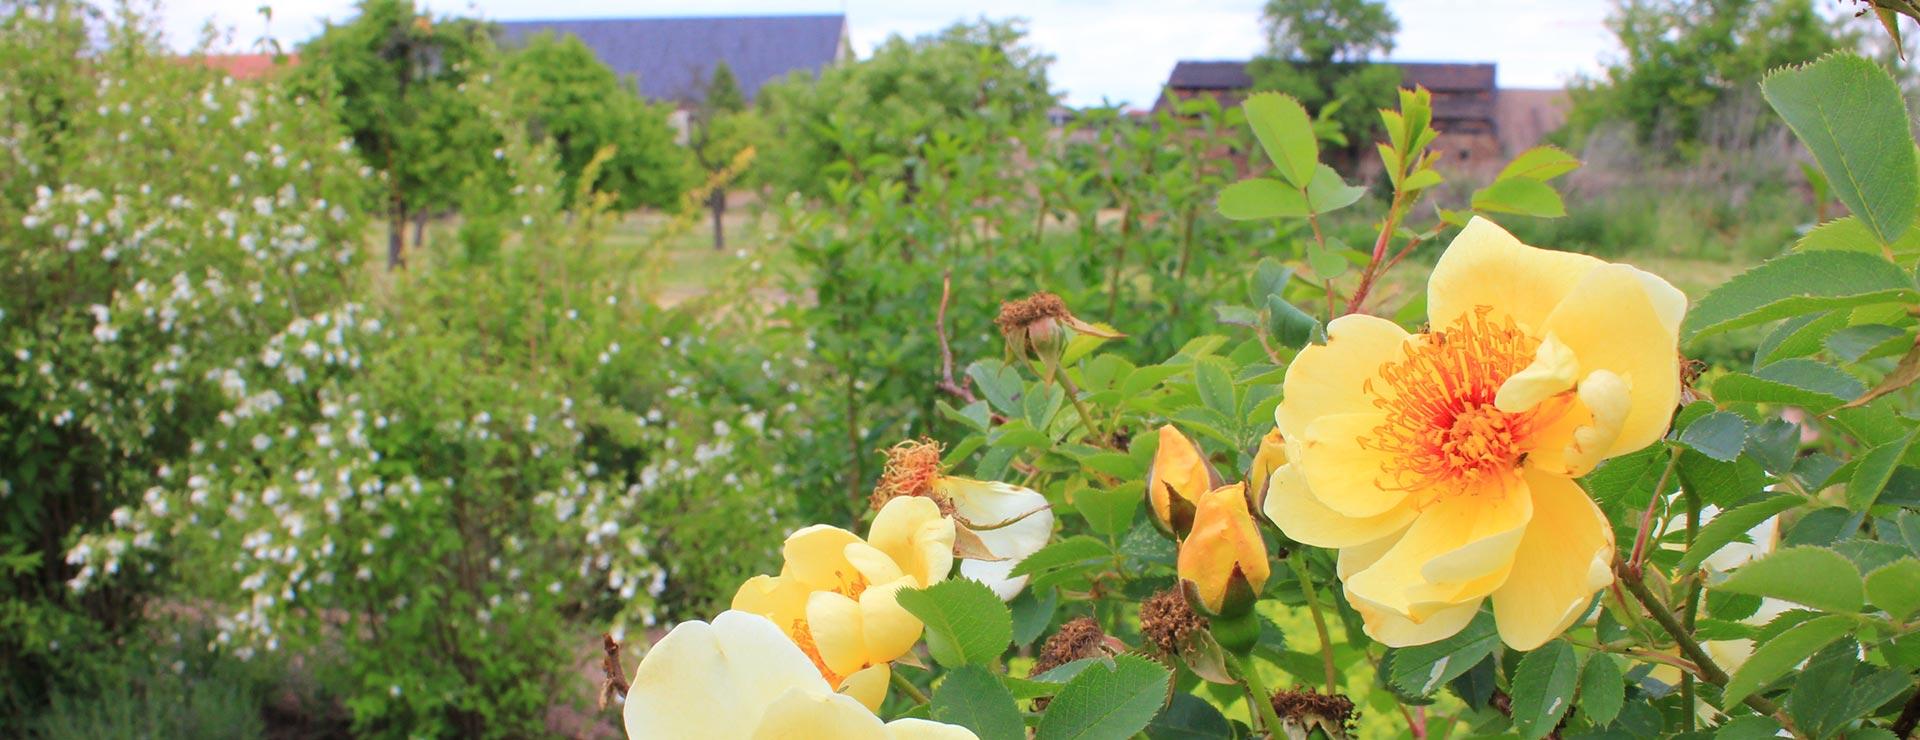 Blüten im Lebendigen Labyrinth im Naherholungsziel Kloster Helfta in Eisleben